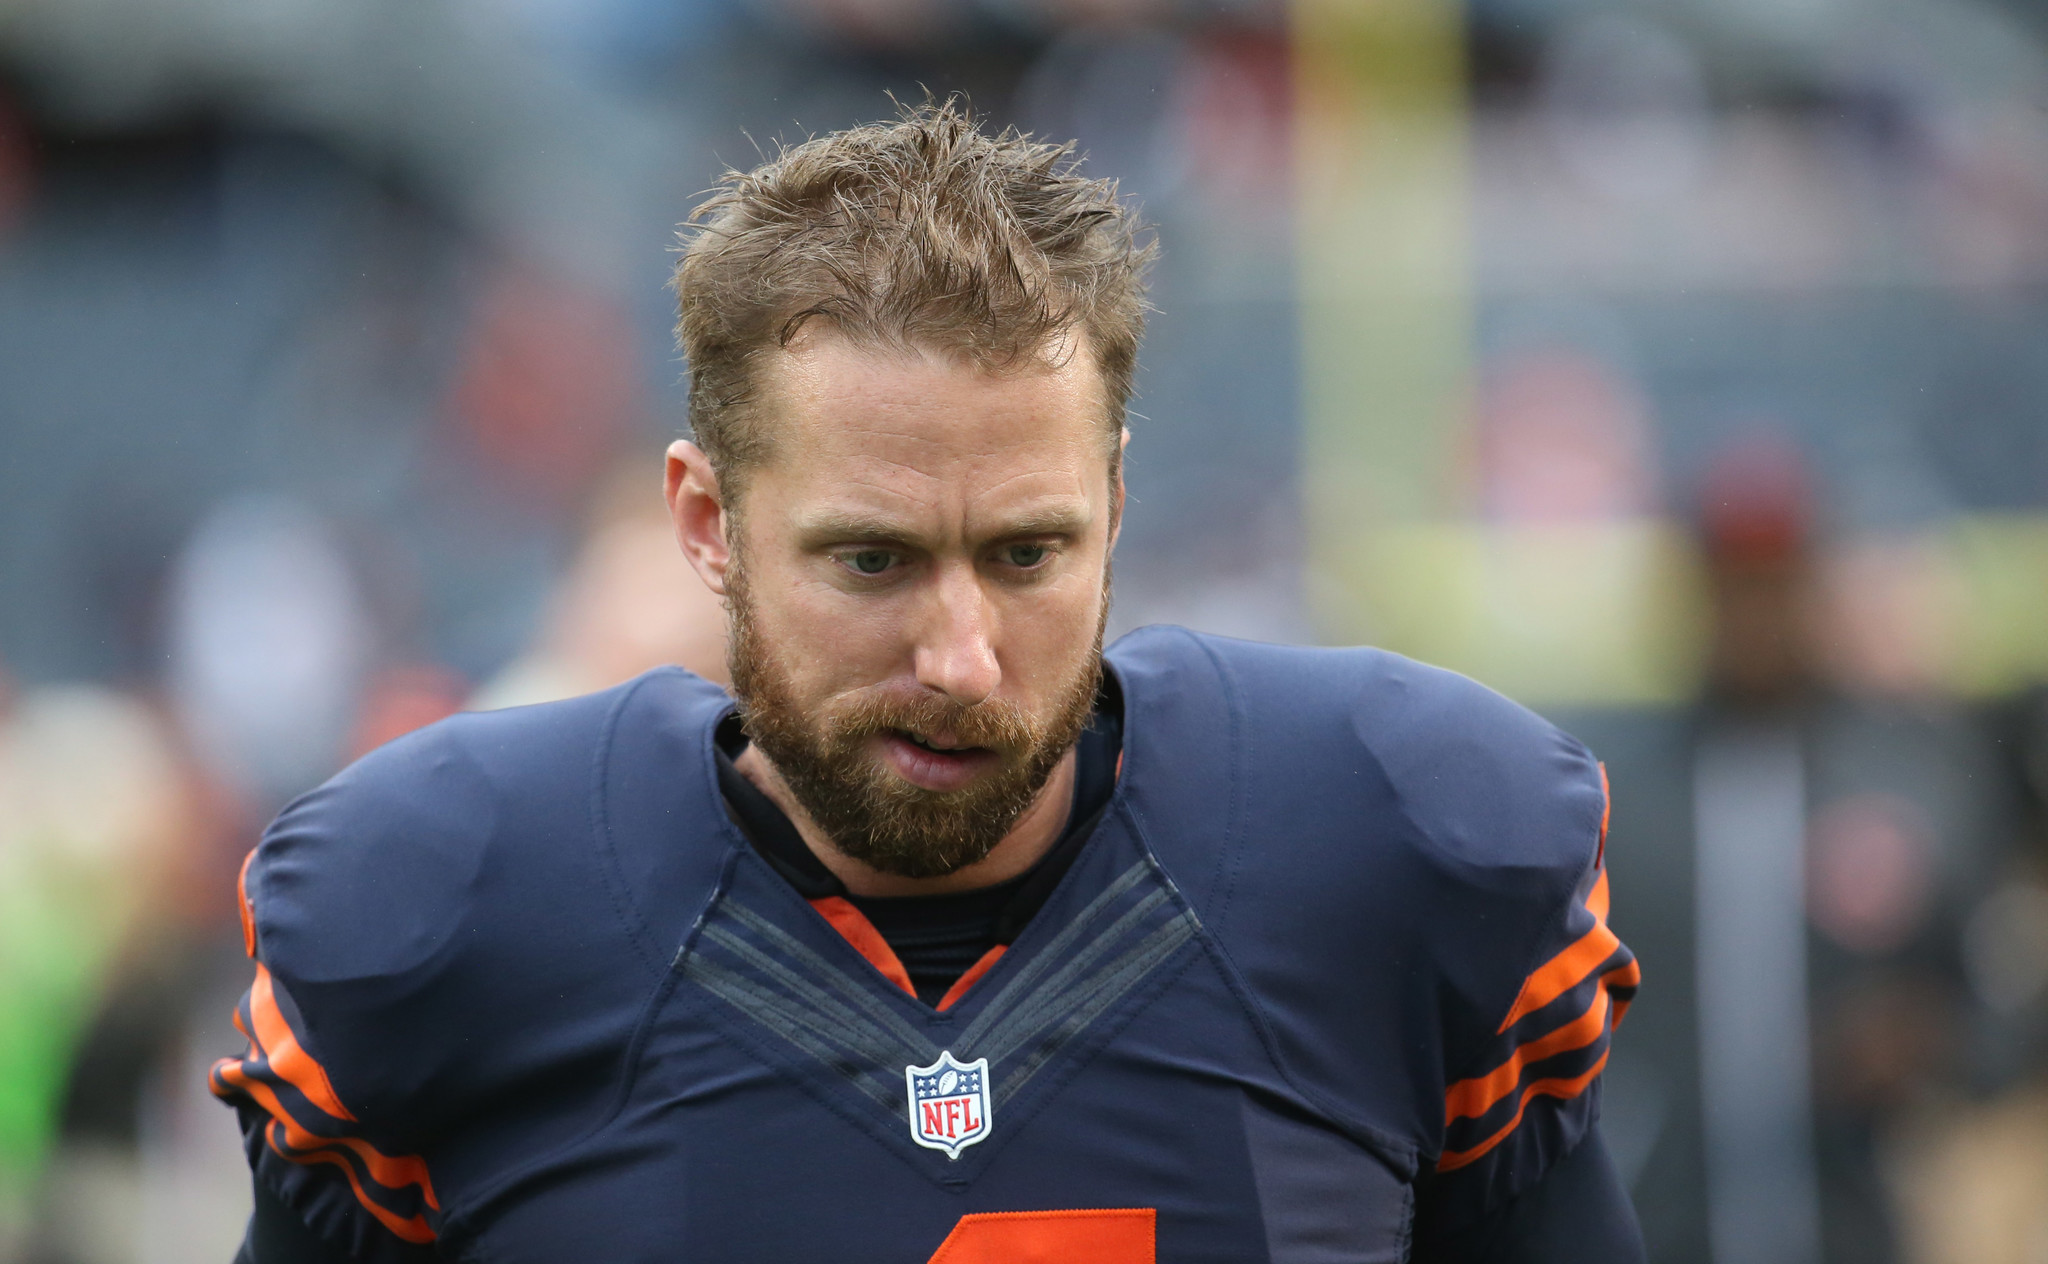 Bears re-sign kicker Connor Barth - Capital Gazette